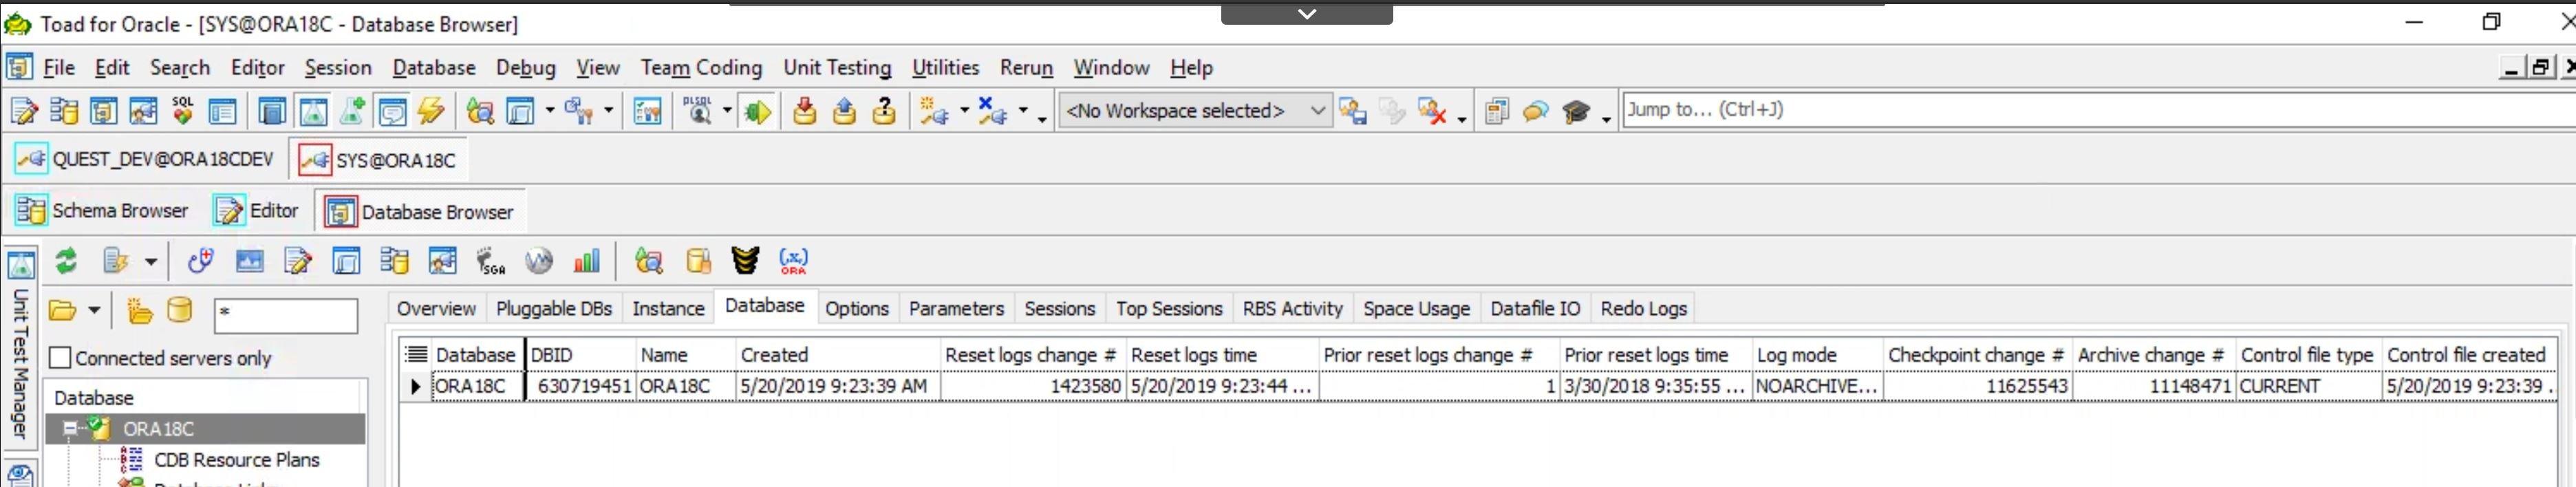 Multi database viewing option.